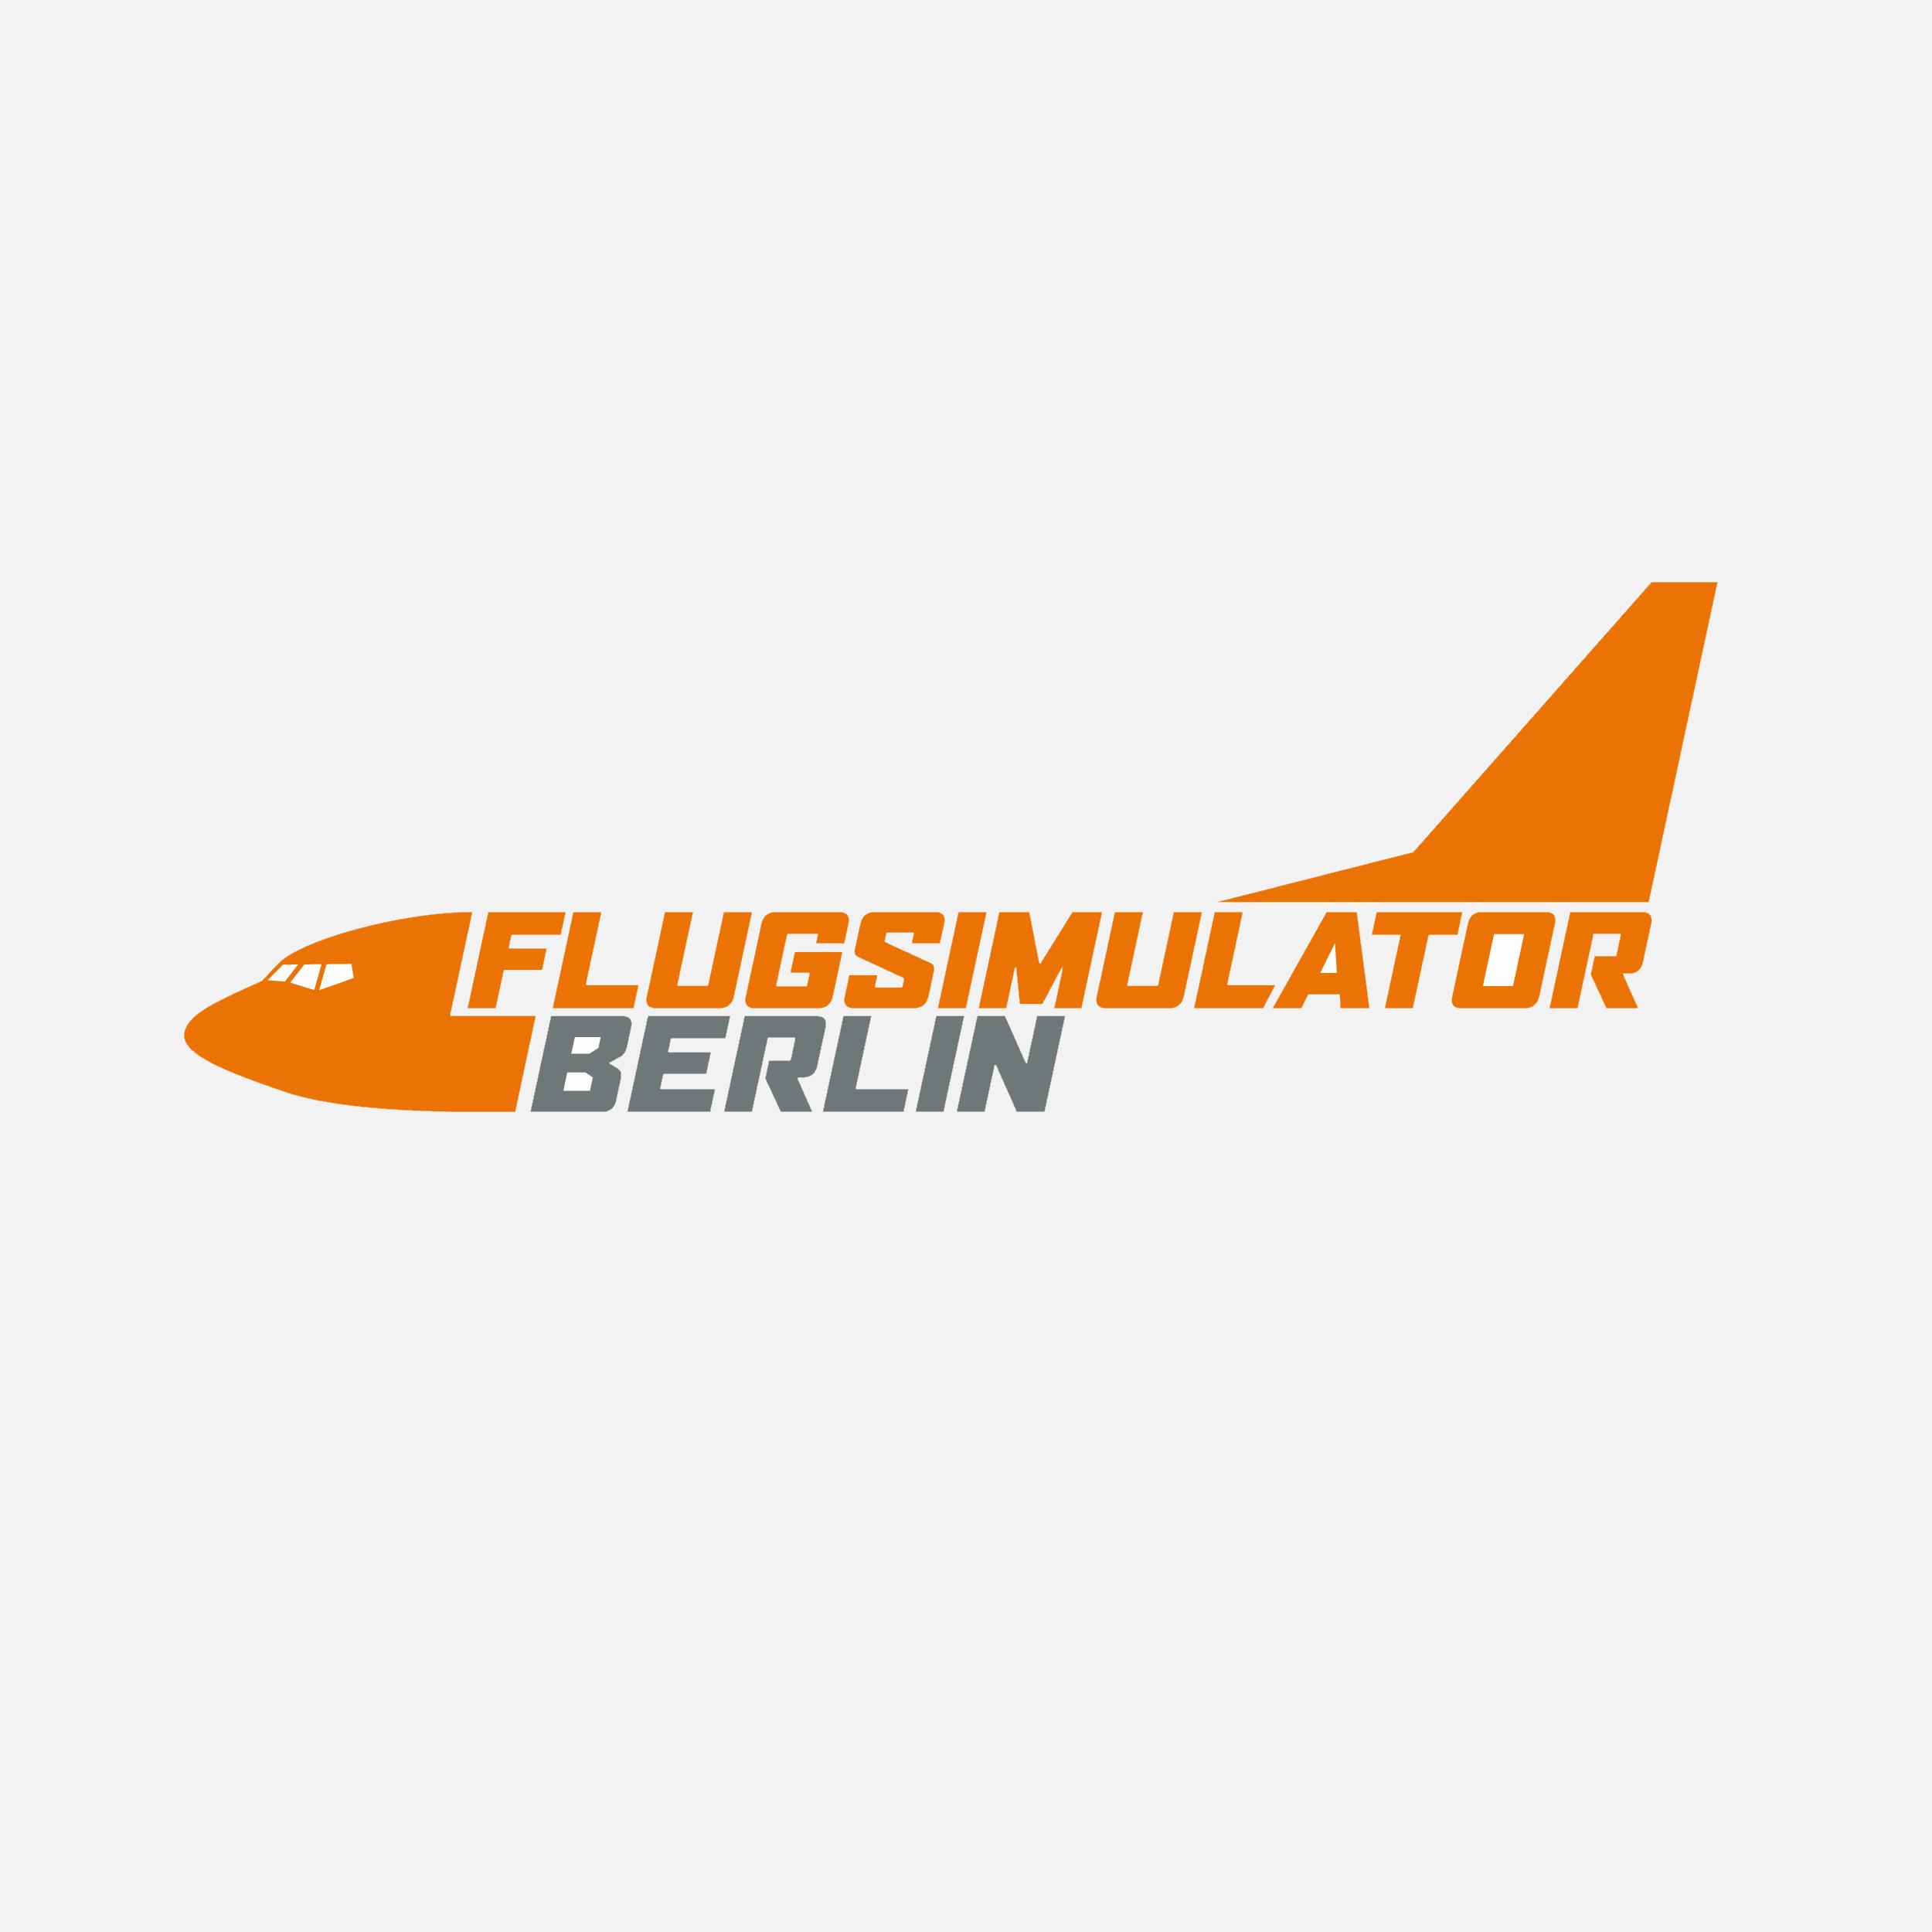 Flugsimulator Berlin – Das Original Profile Picture